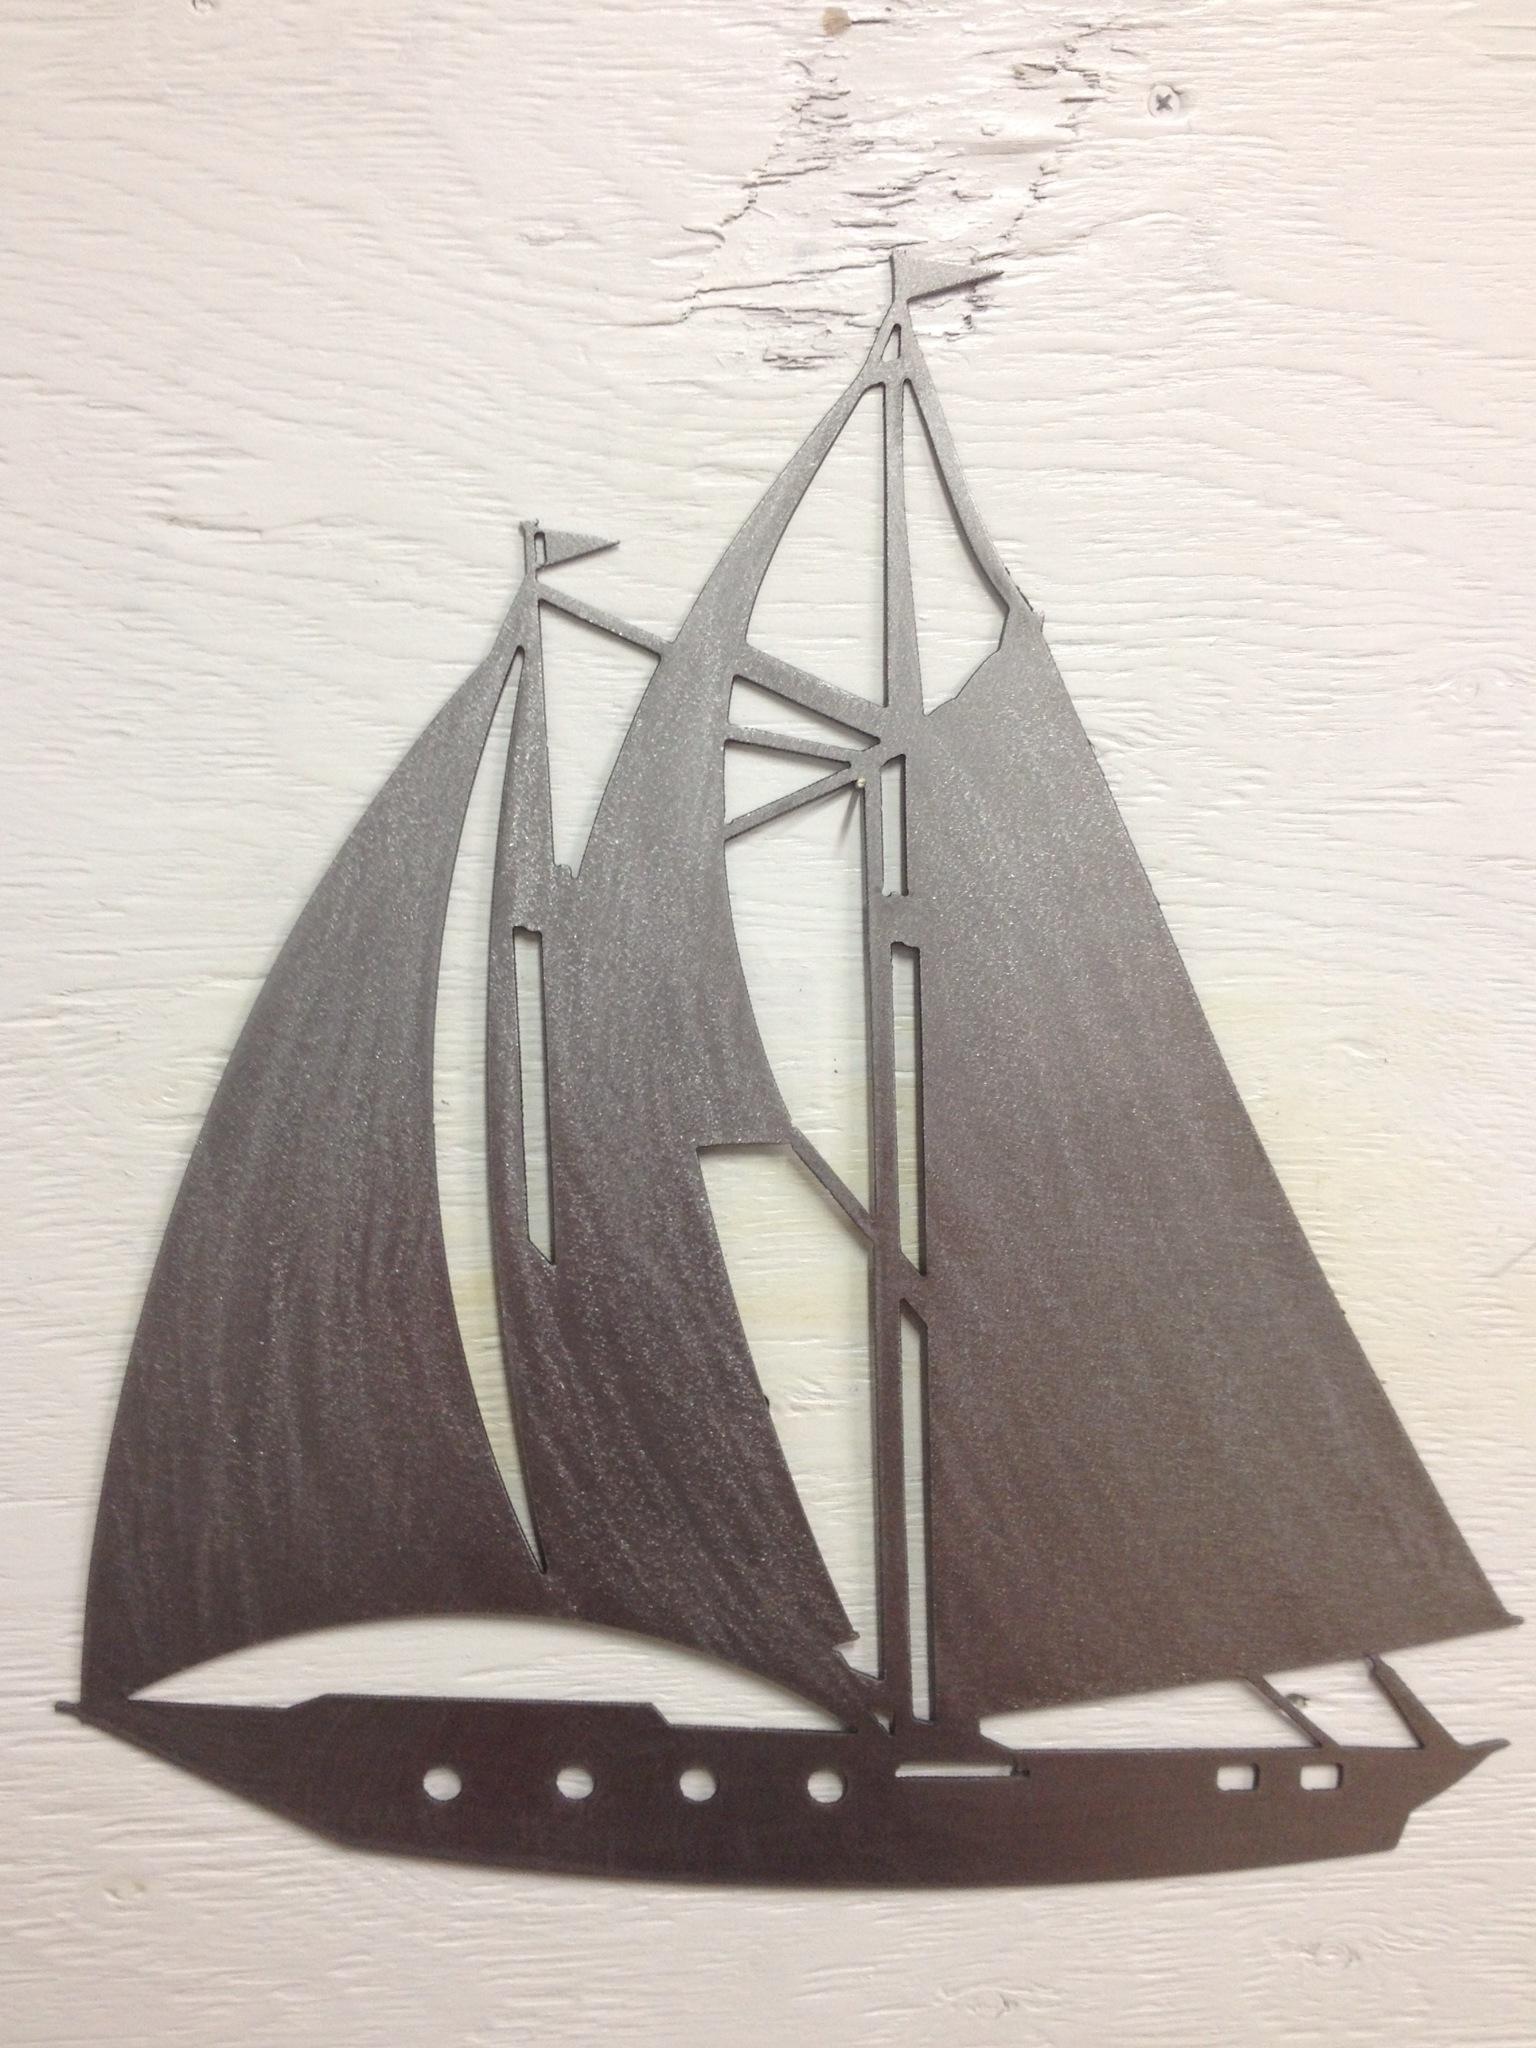 2017 Sailboat, Nautical, Boats, Ocean, Fresh Water, Salt Water, Sails Within Sailboat Metal Wall Art (View 12 of 15)